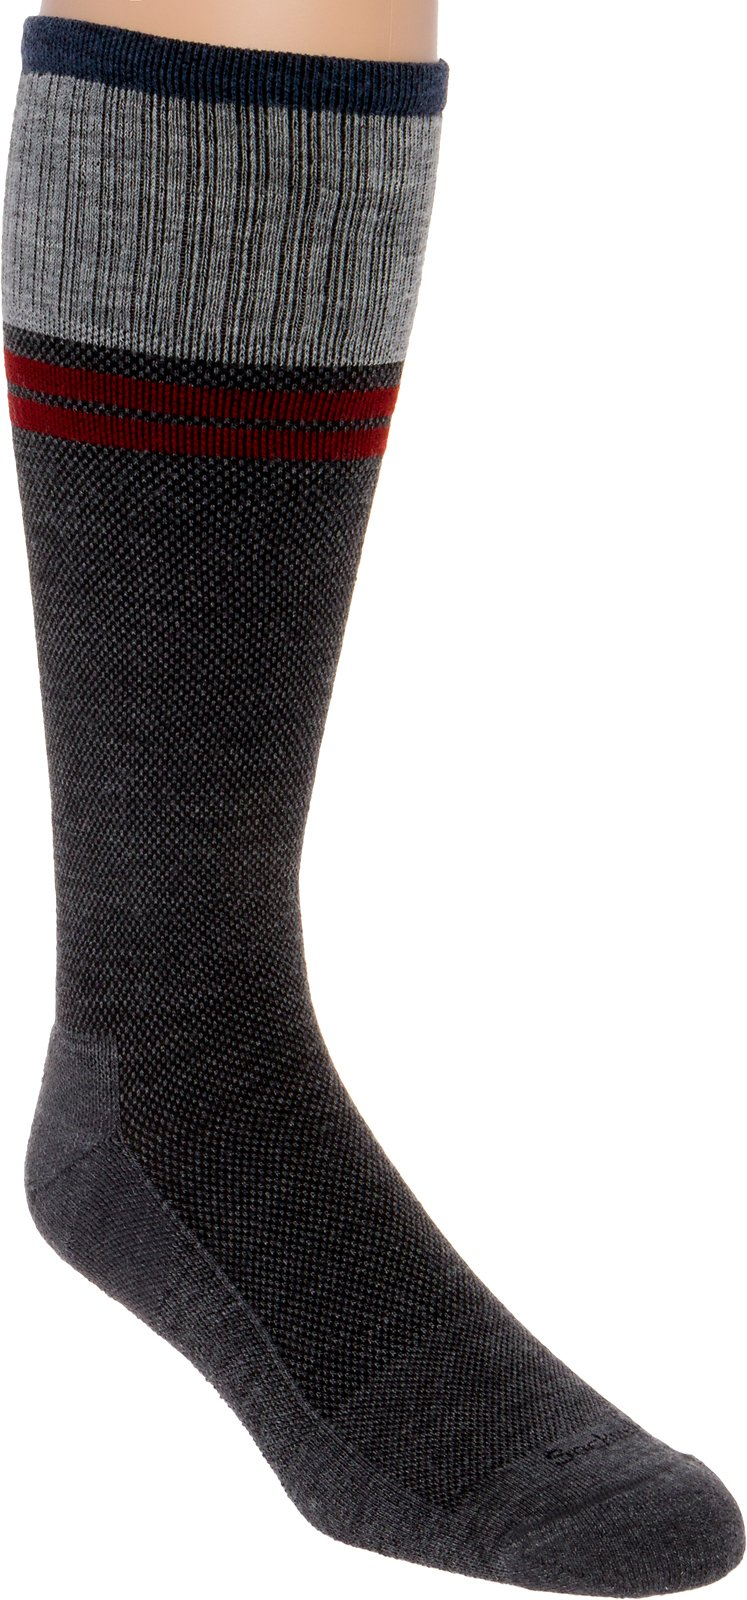 Sockwell Men's Sportster Moderate Compression Socks (Charcoal, L/XL)